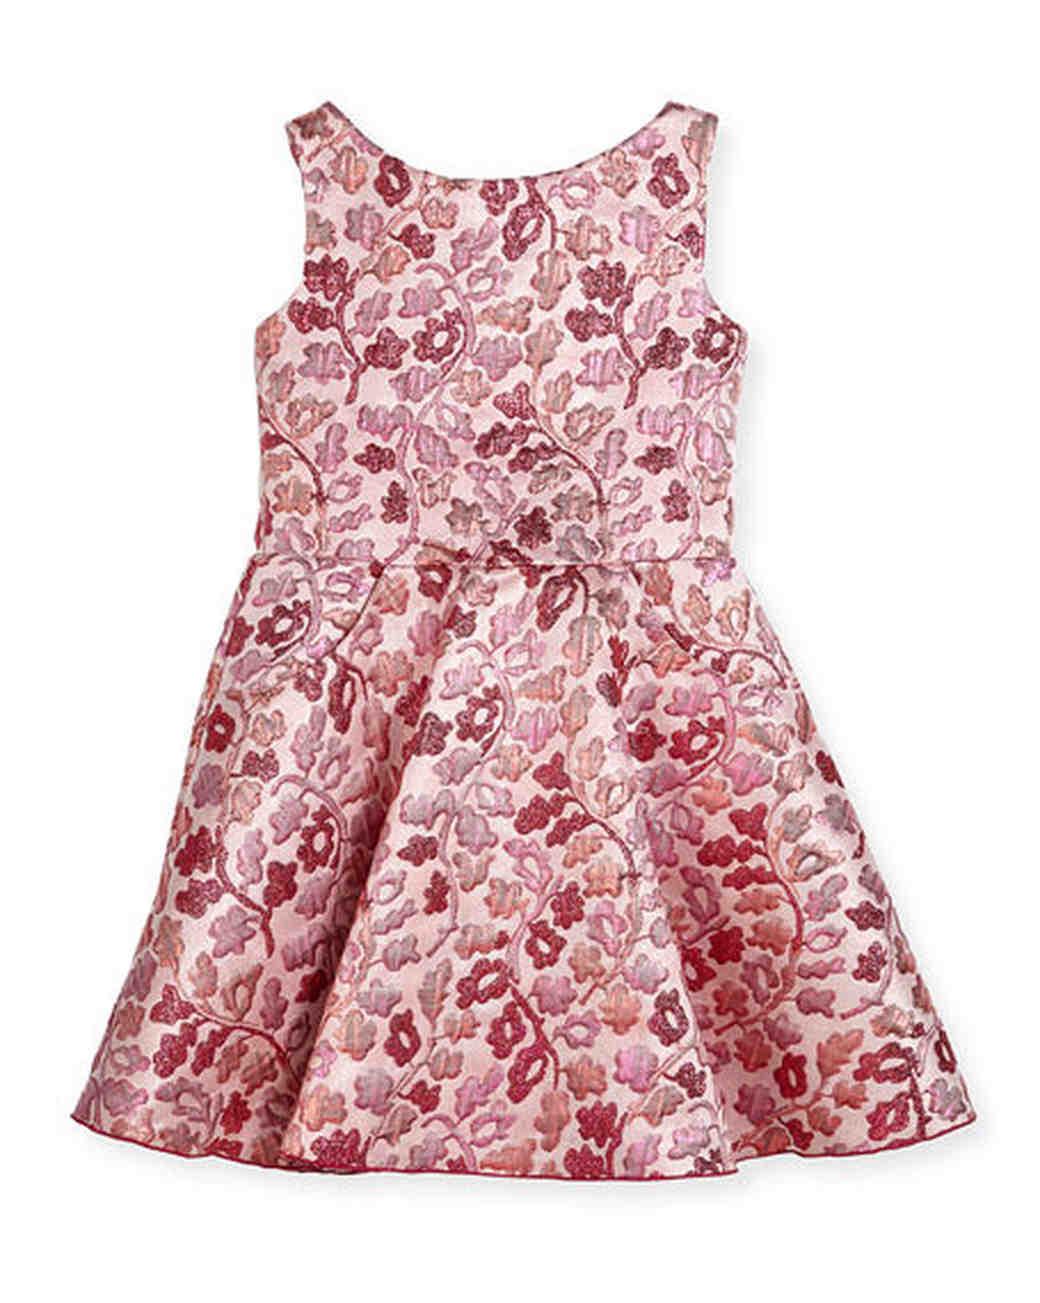 pink red floral flower girl dress